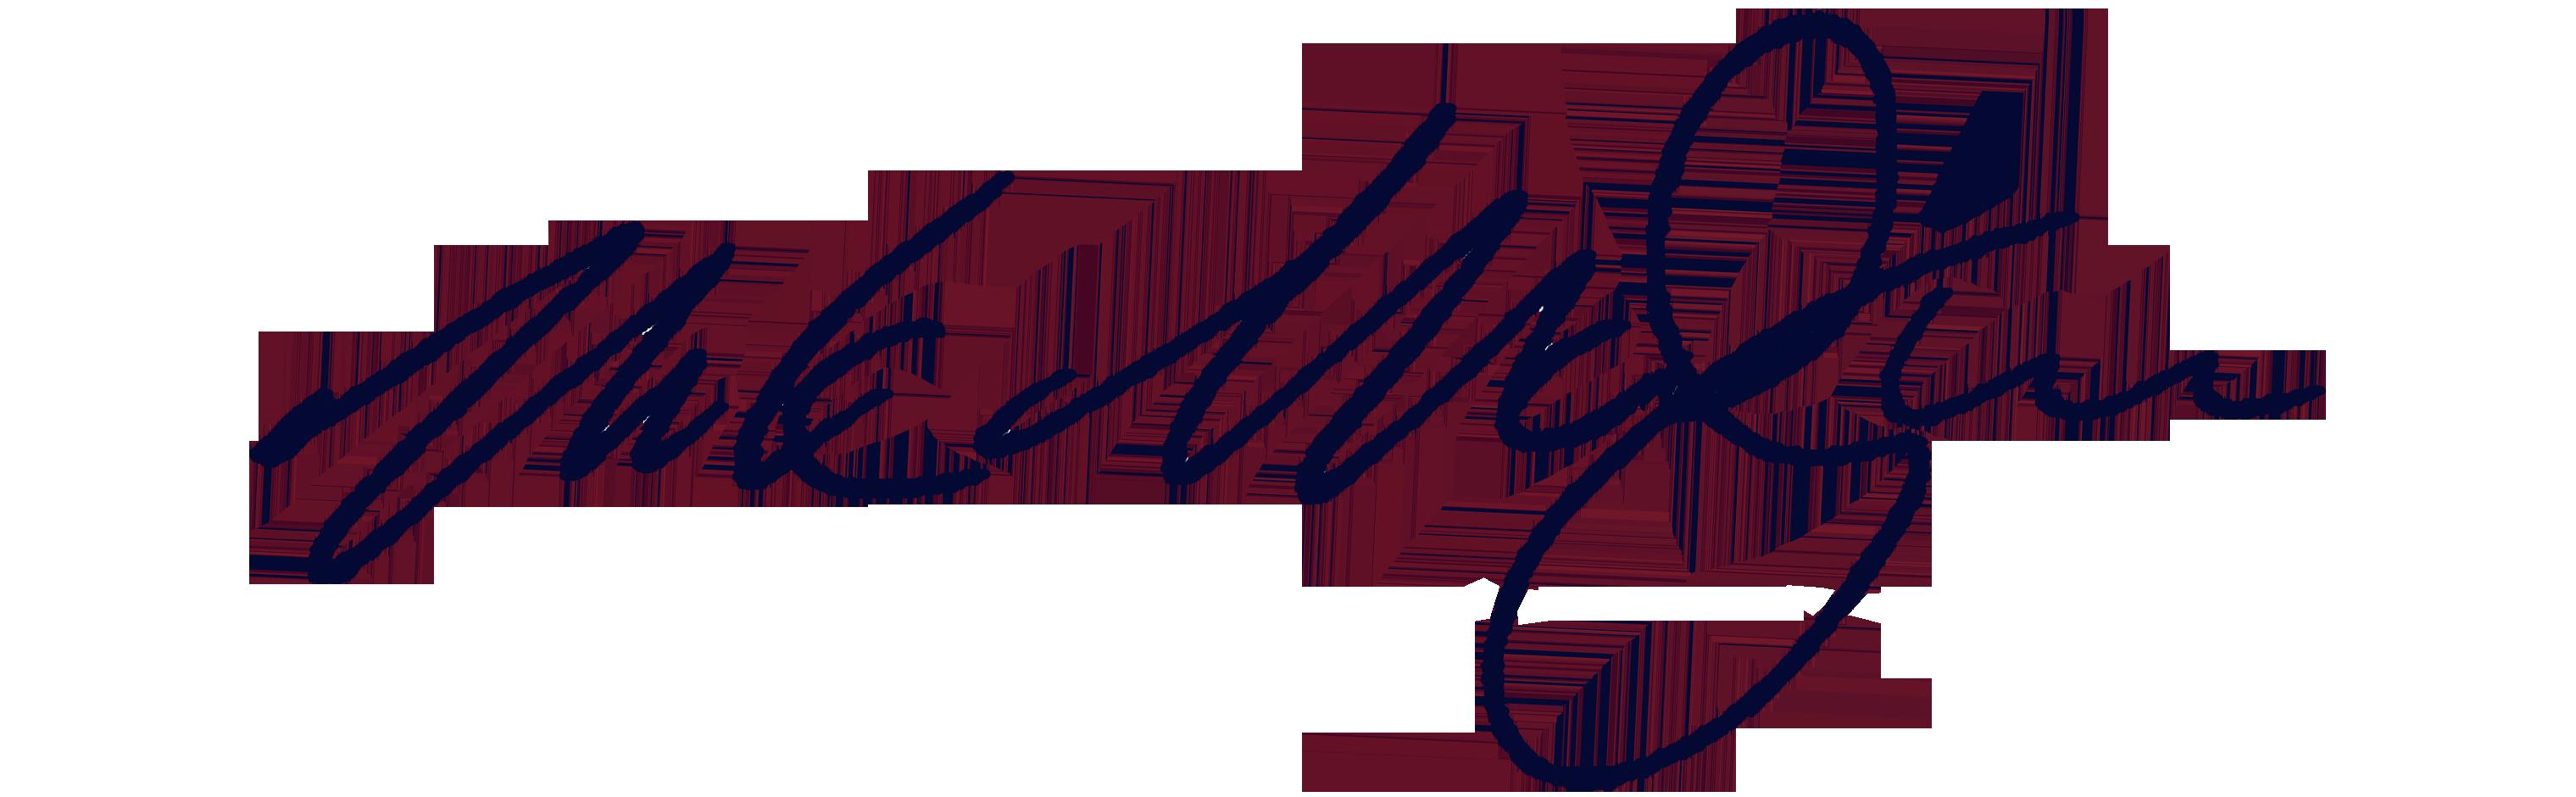 nick_mcgirr_autograph_signature